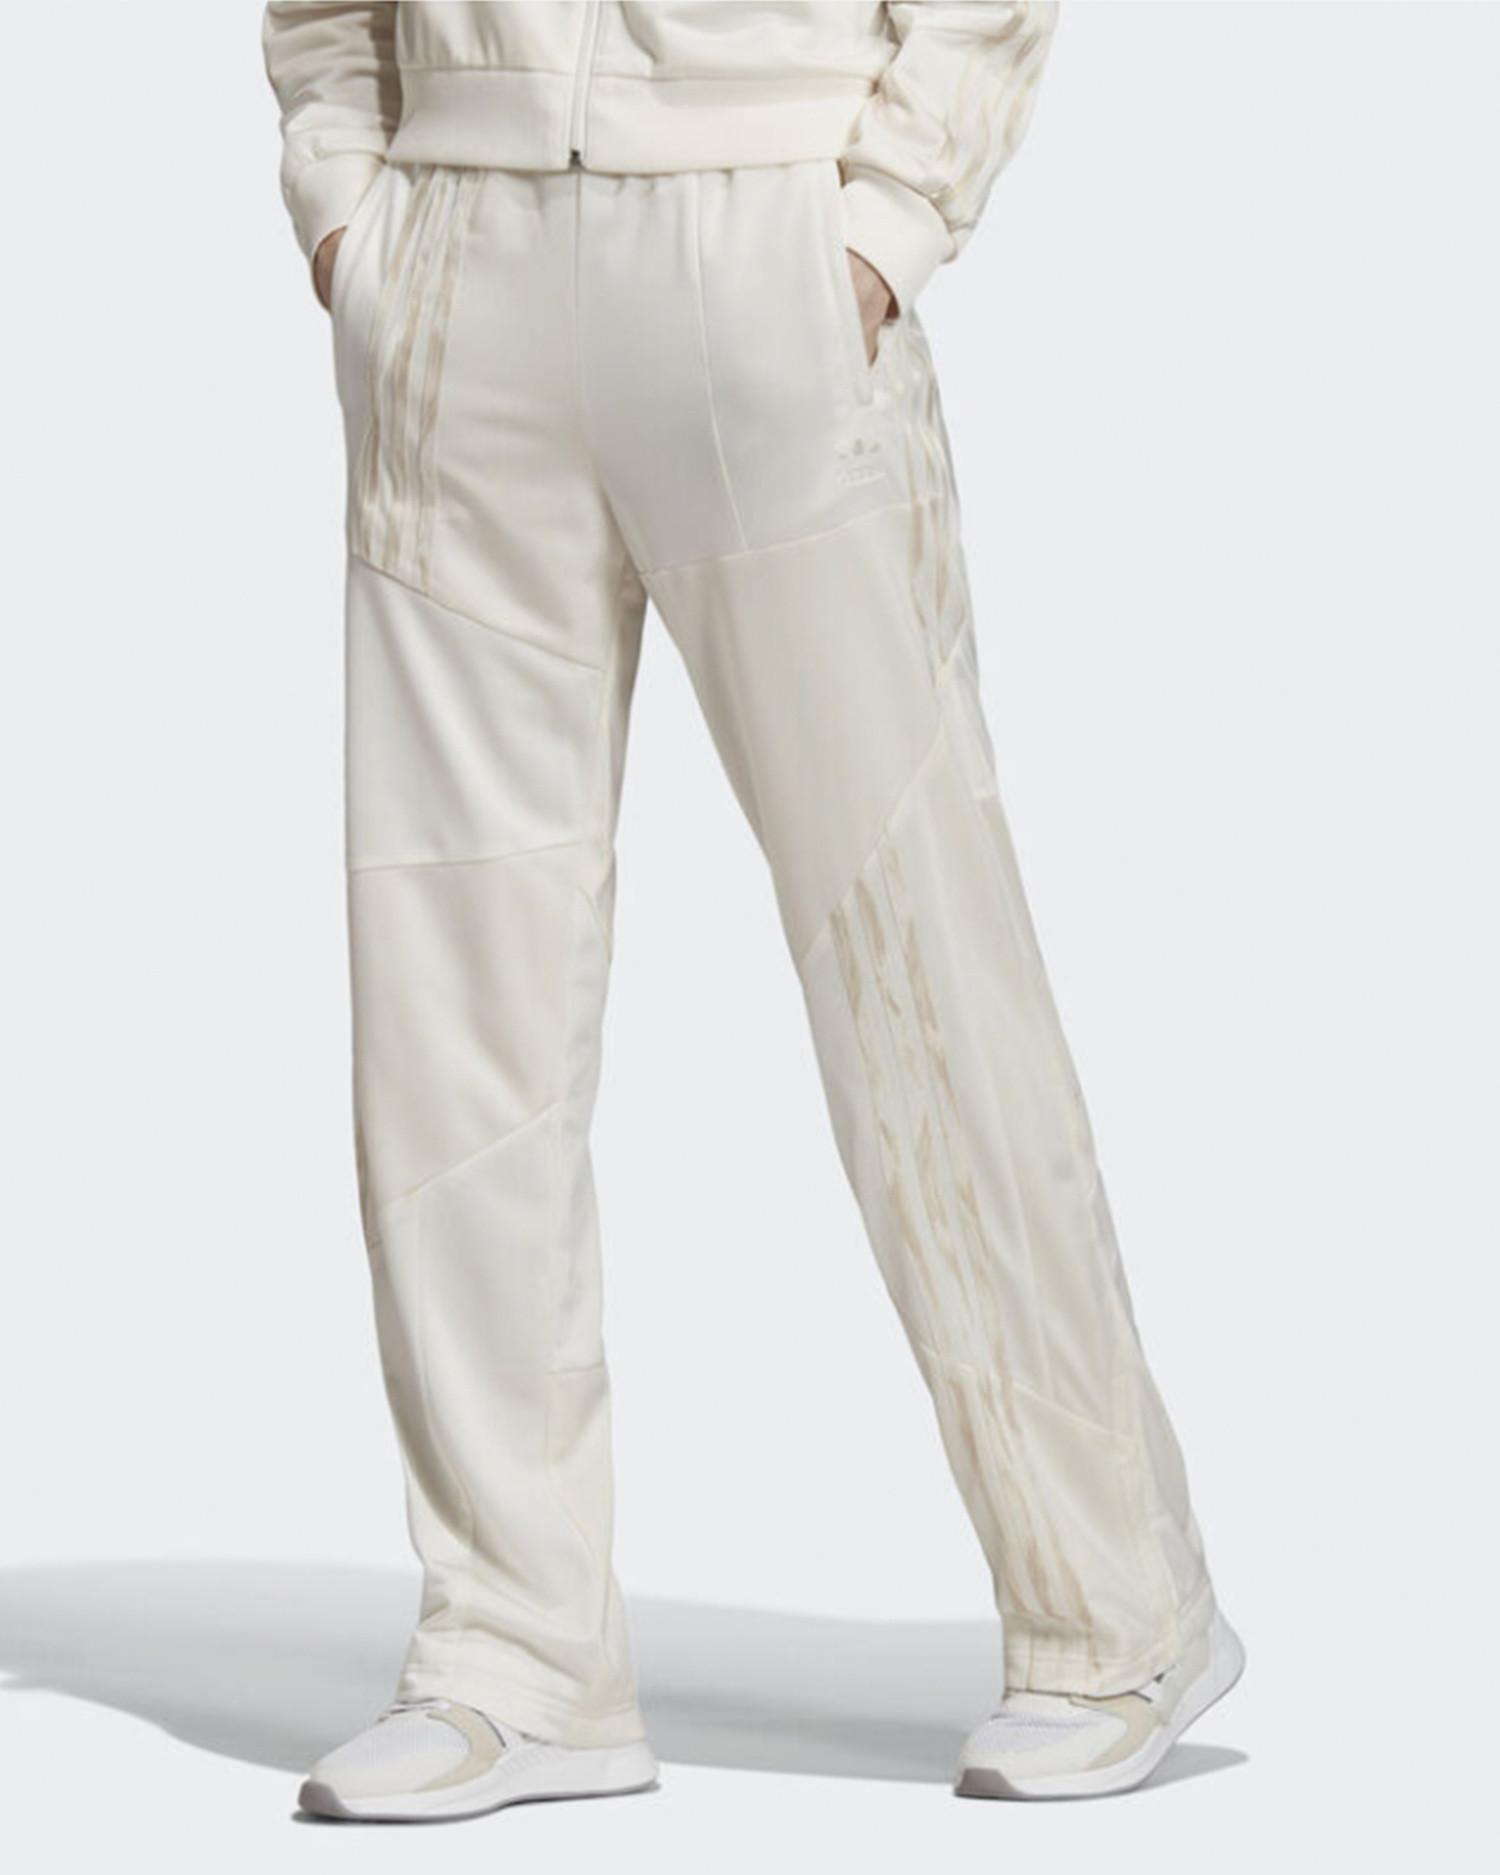 Adidas DaniÌÎÌàlle Cathari Trackpant Firebird Cloud White